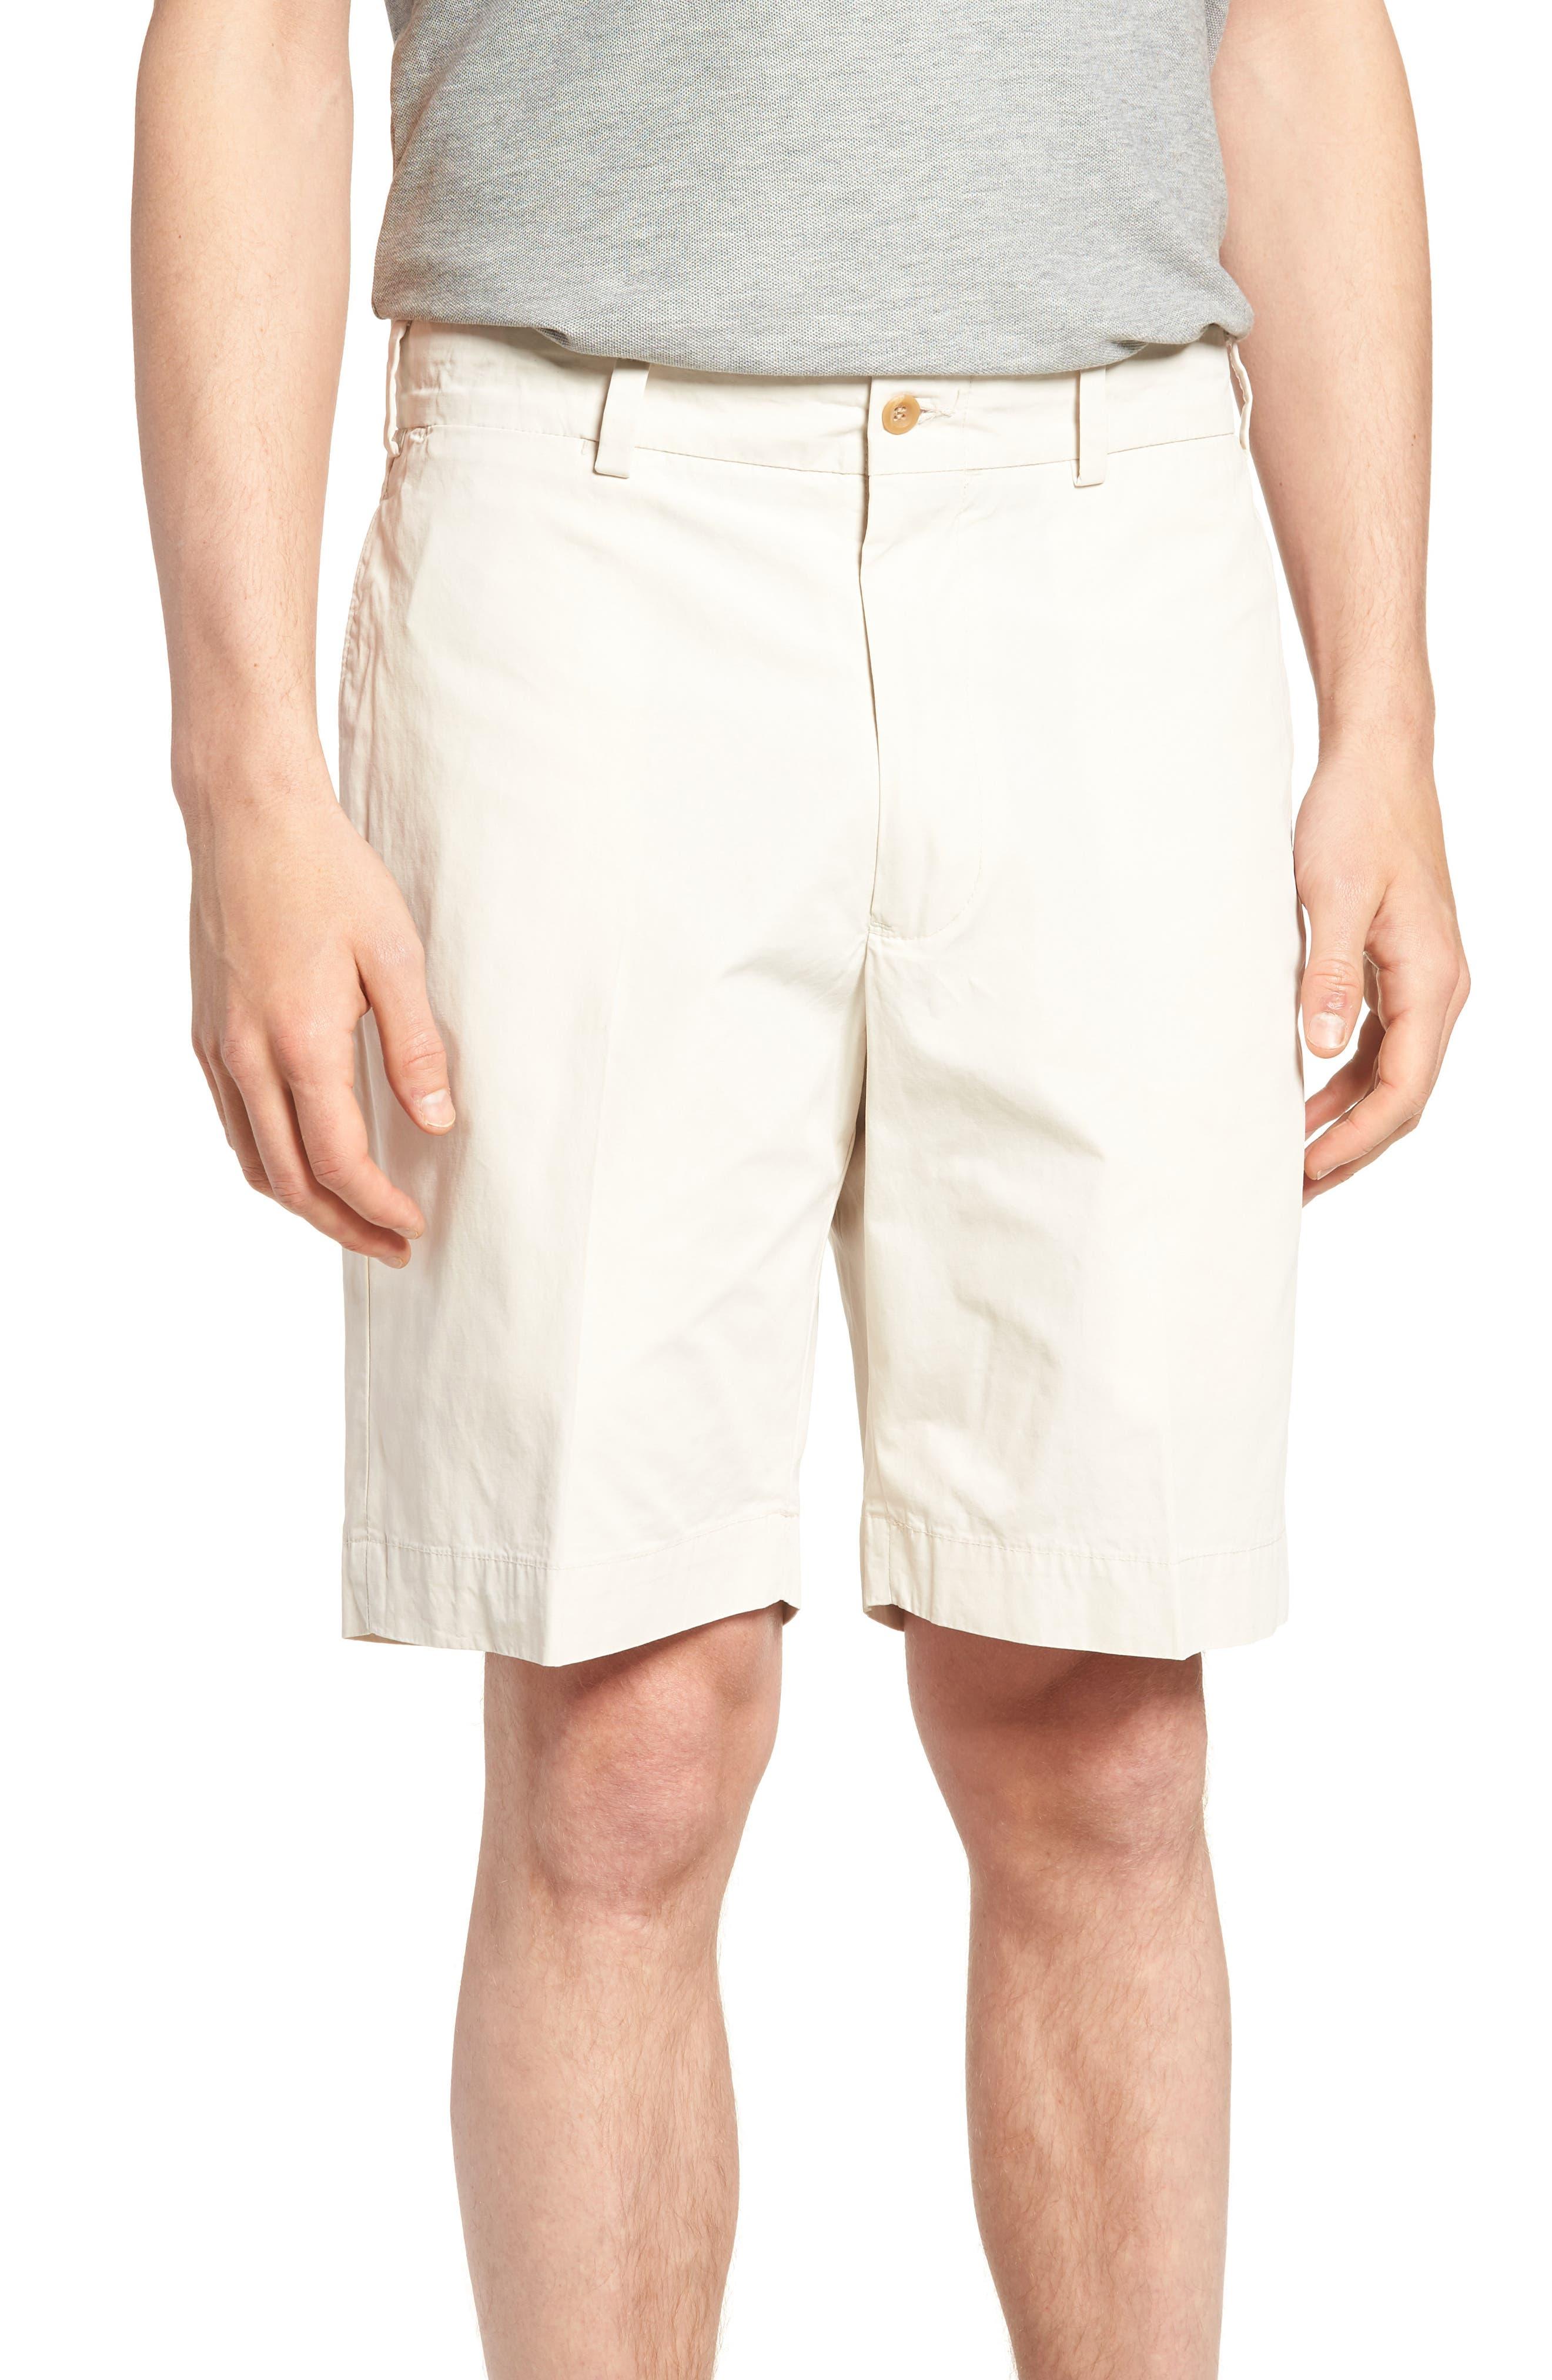 M2 Standard Fit Flat Front Tropical Cotton Poplin Shorts,                         Main,                         color, 280